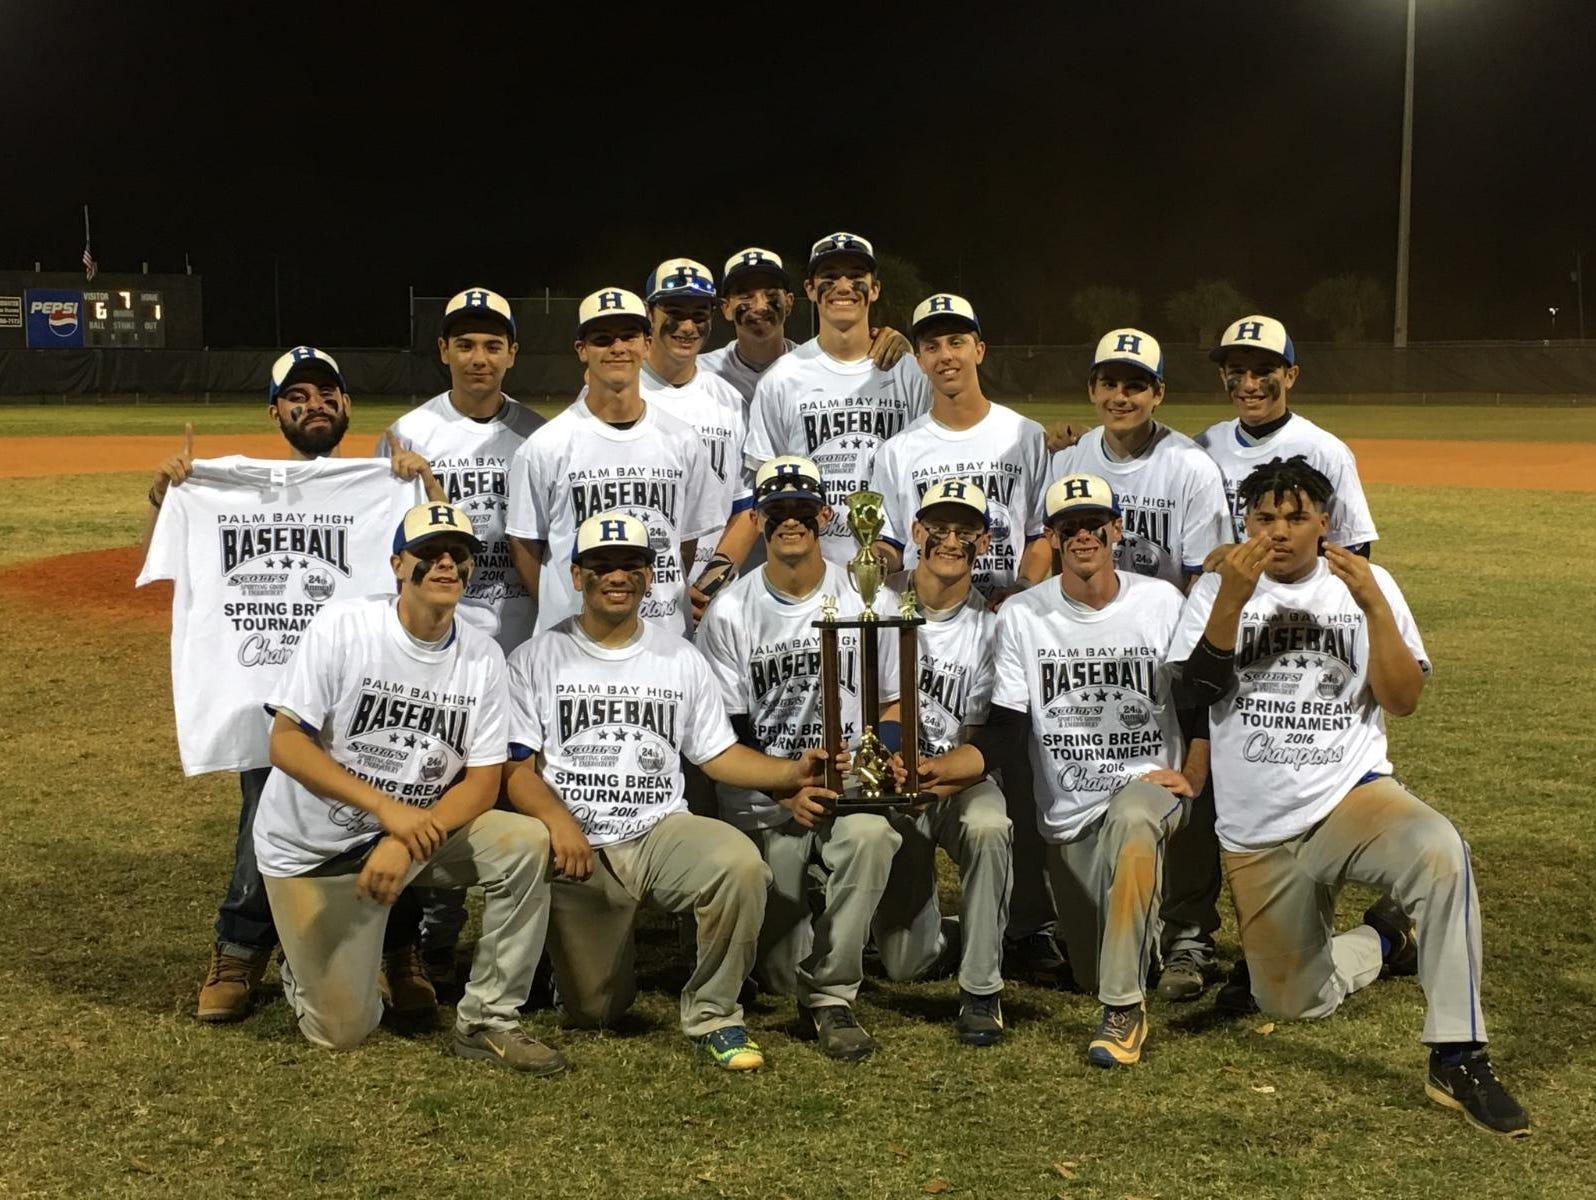 The Heritage baseball team won Palm Bay's spring break tournament last week.